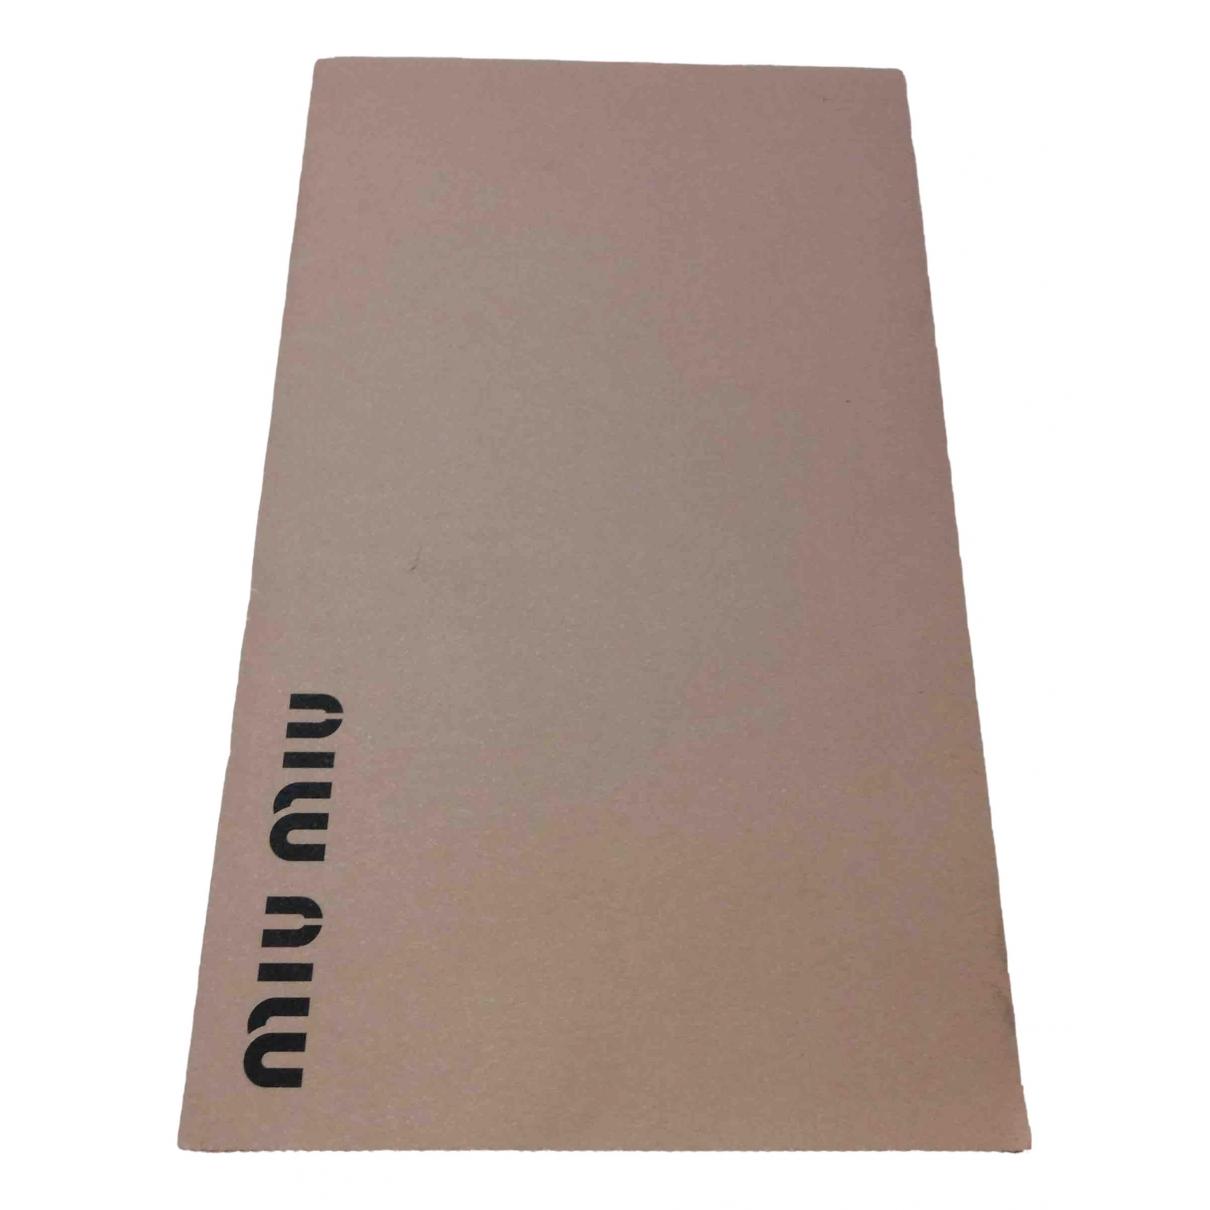 Miu Miu - Mode   pour lifestyle en coton - rose